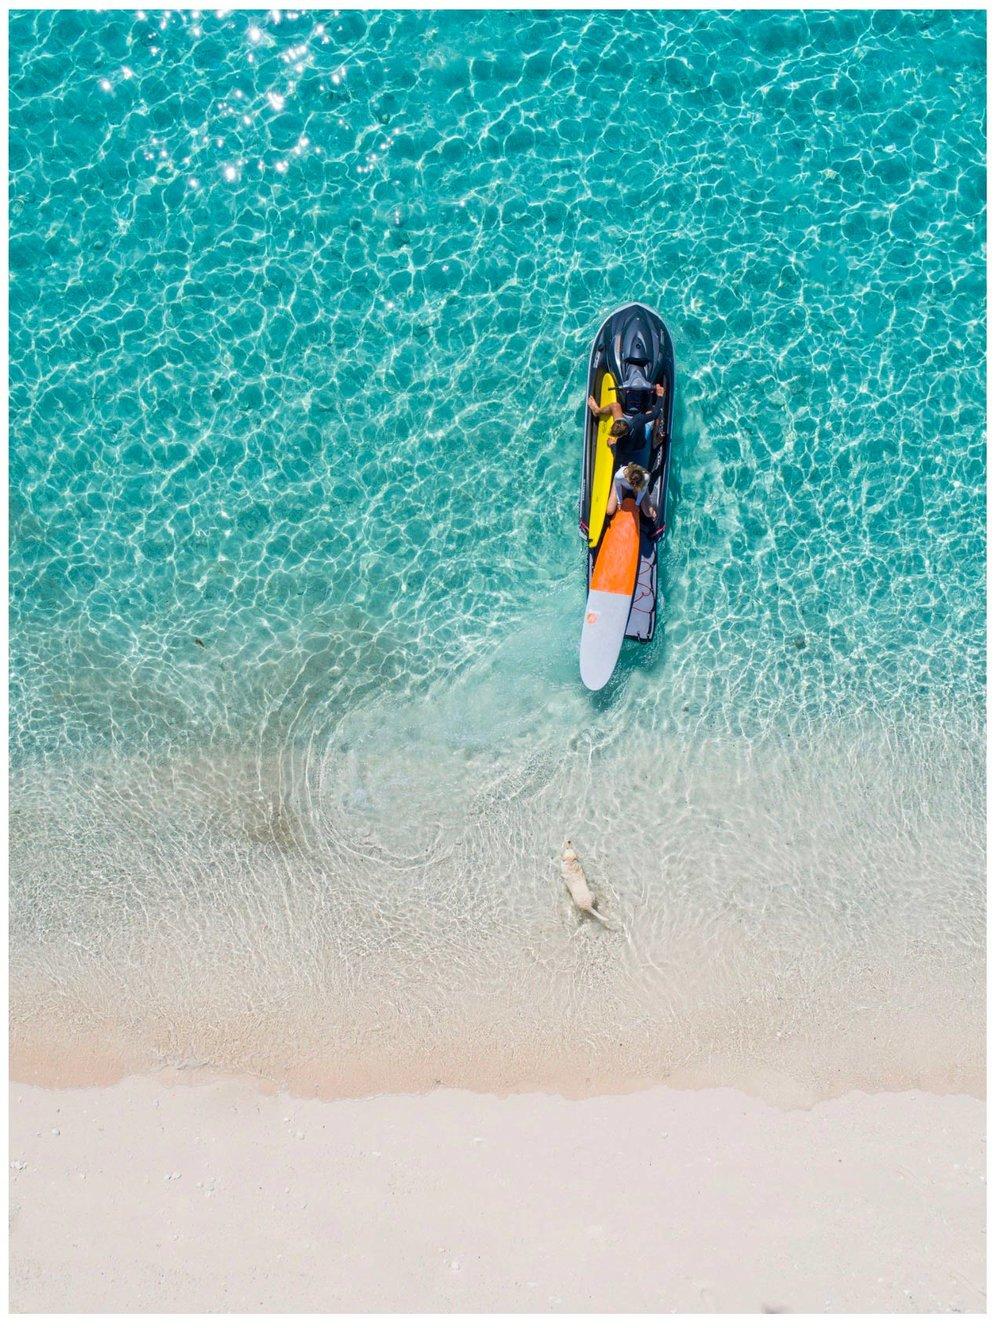 rodd-owen-ocean-surf-photography-for-sale-drone-081.jpg